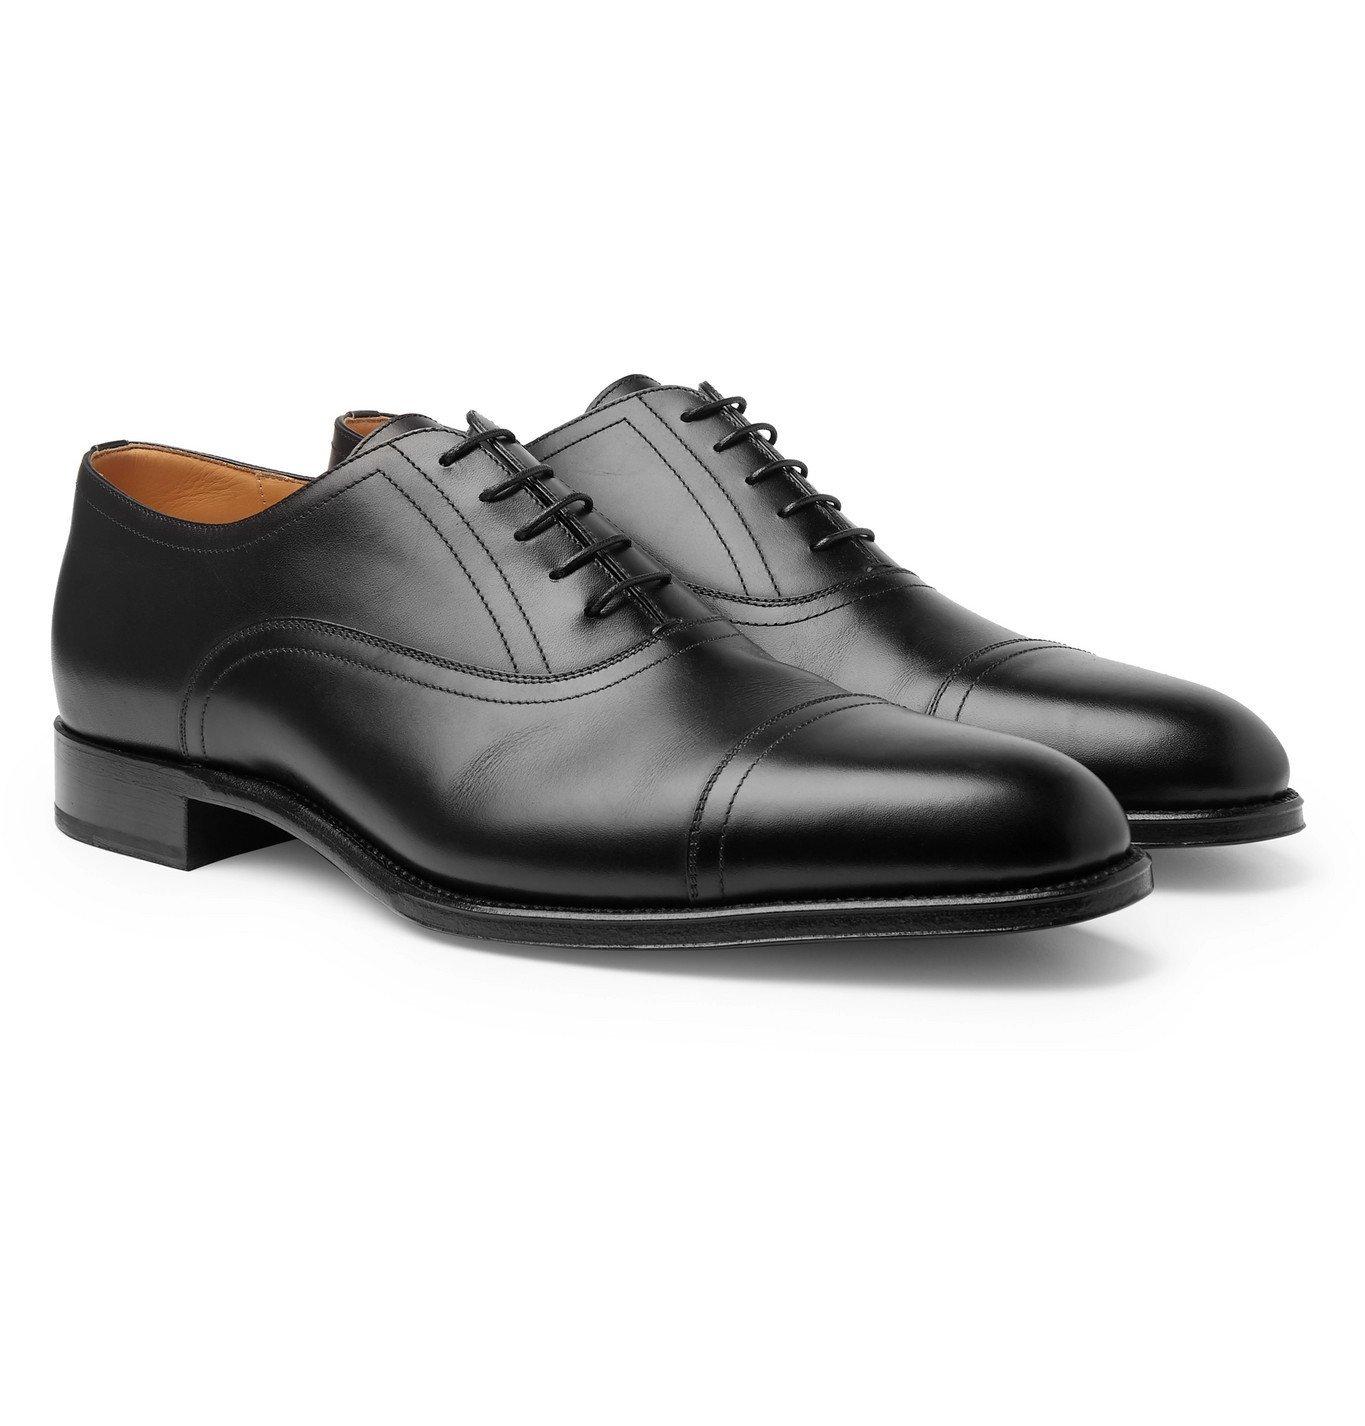 Dunhill - Kensington Leather Oxford Shoes - Black